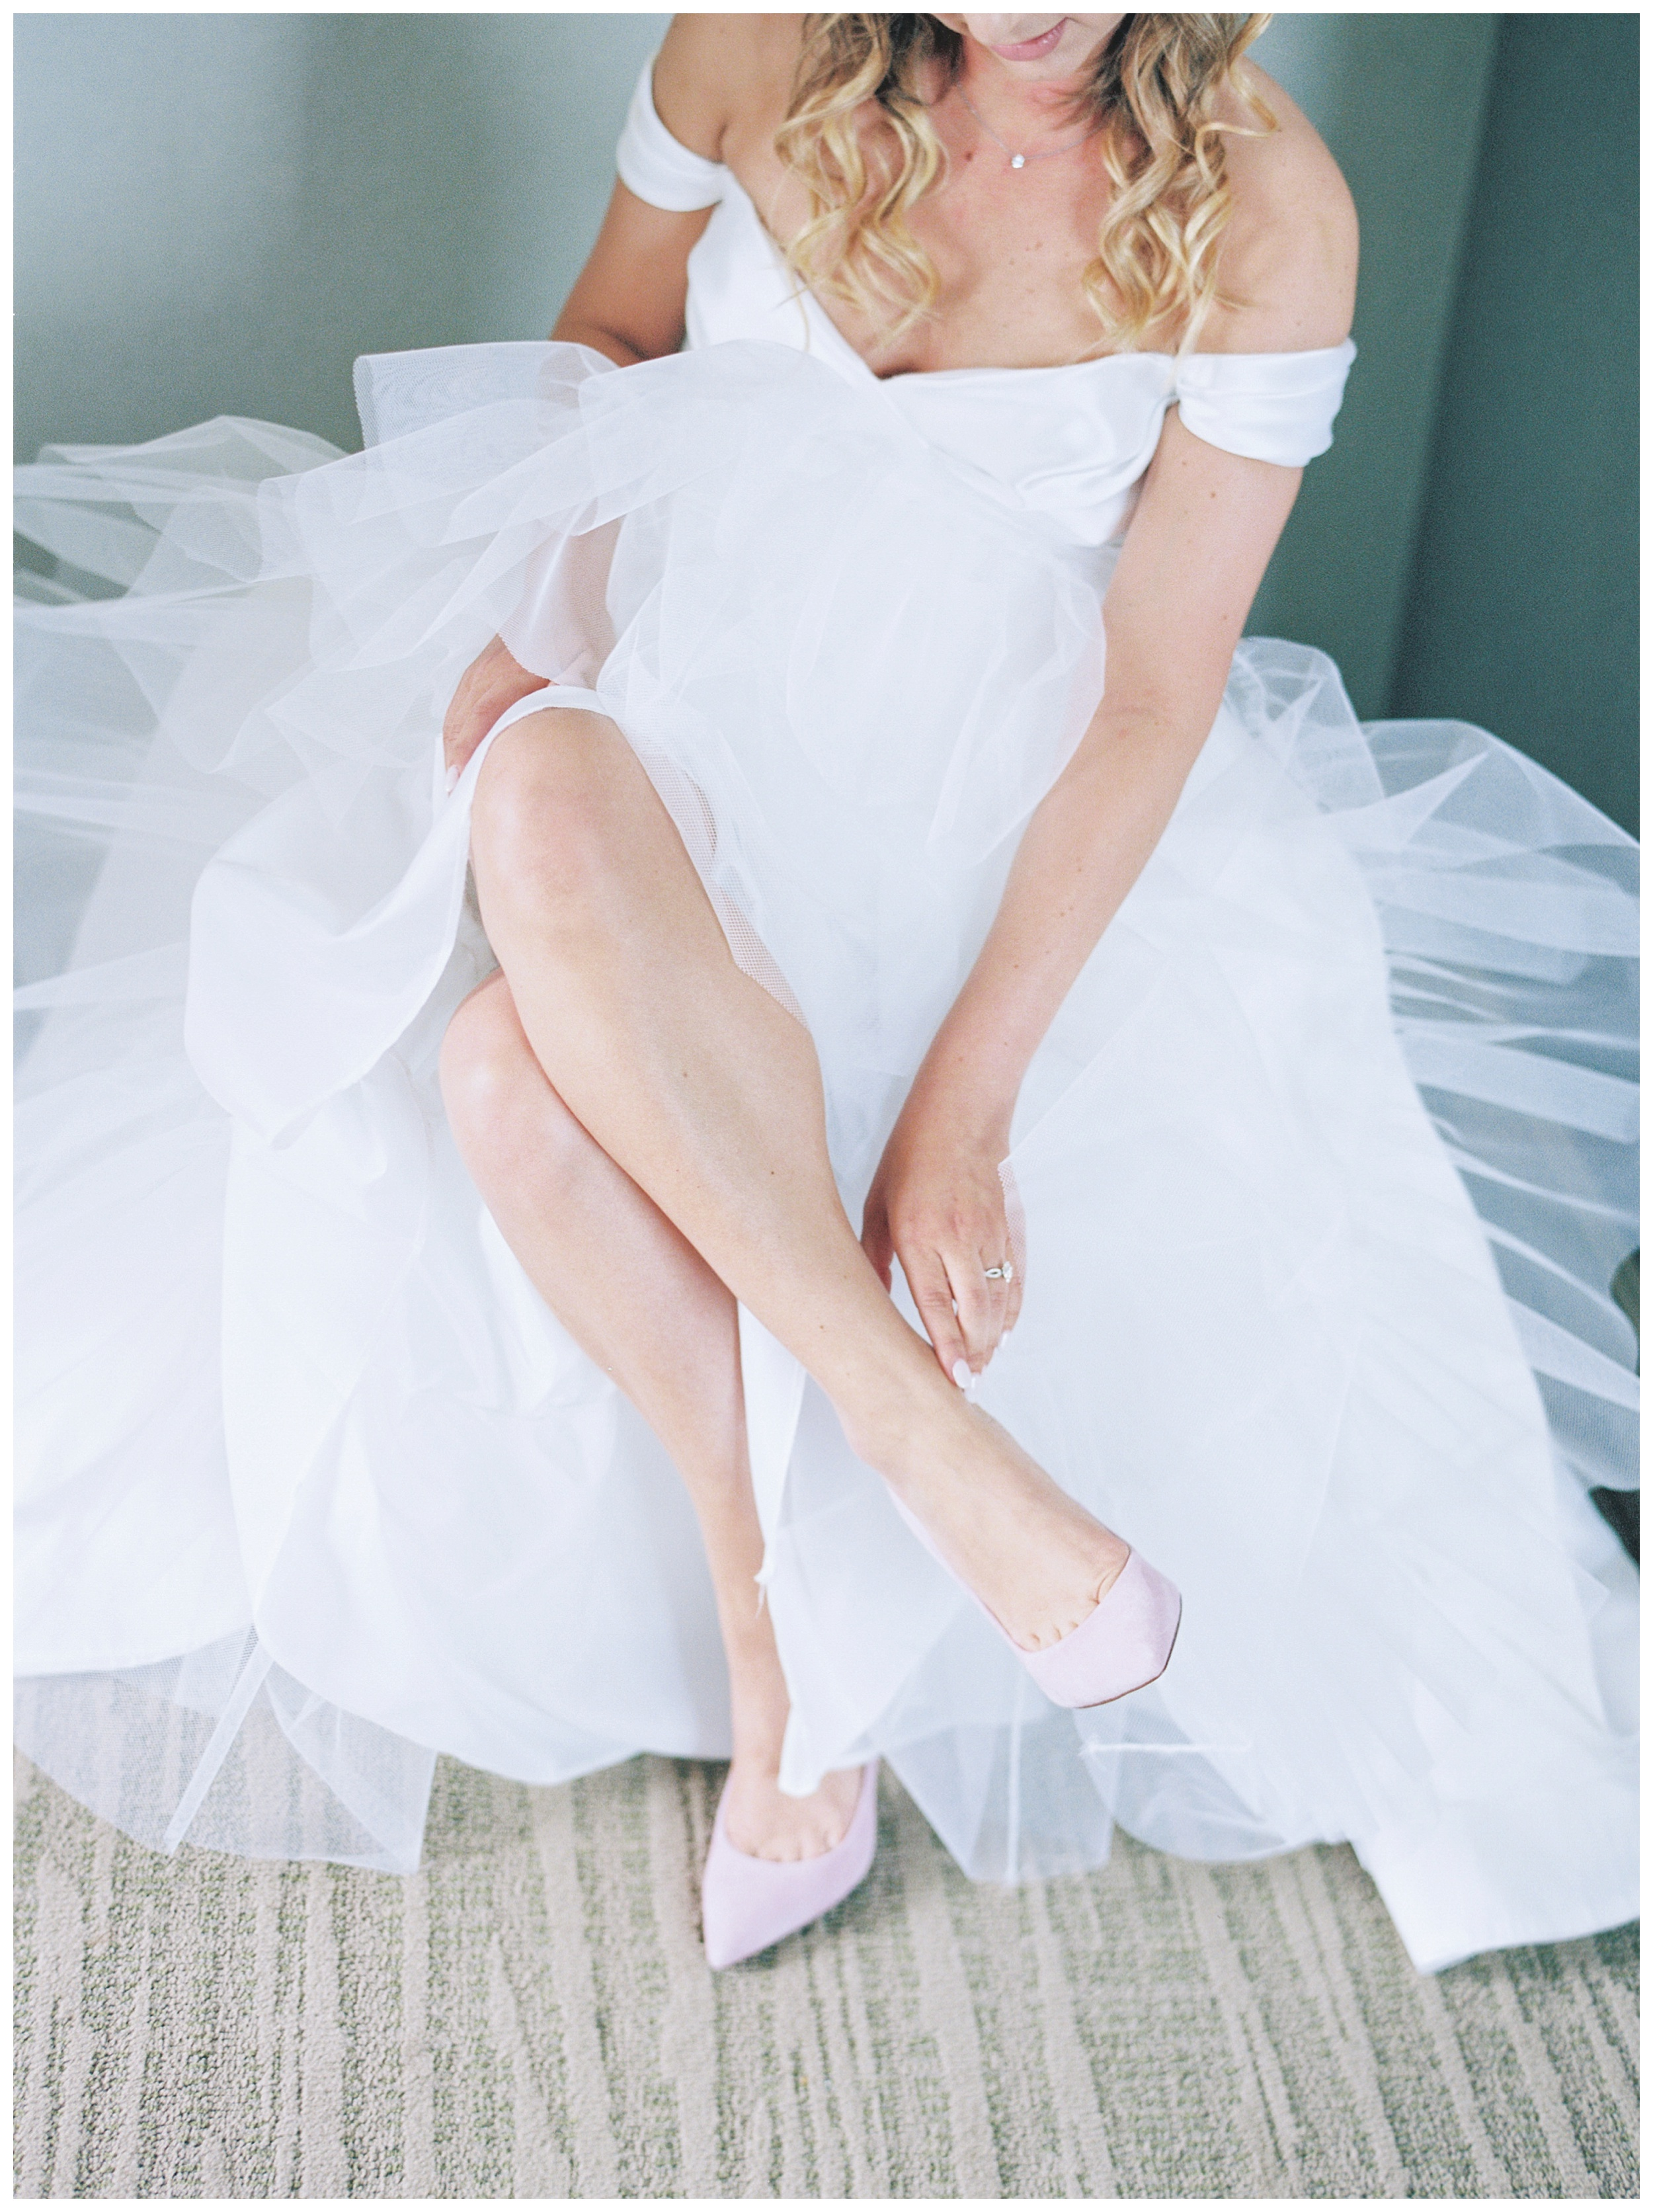 Lansdowne Resort Wedding | Virginia Film Wedding Photographer Kir Tuben_0015.jpg